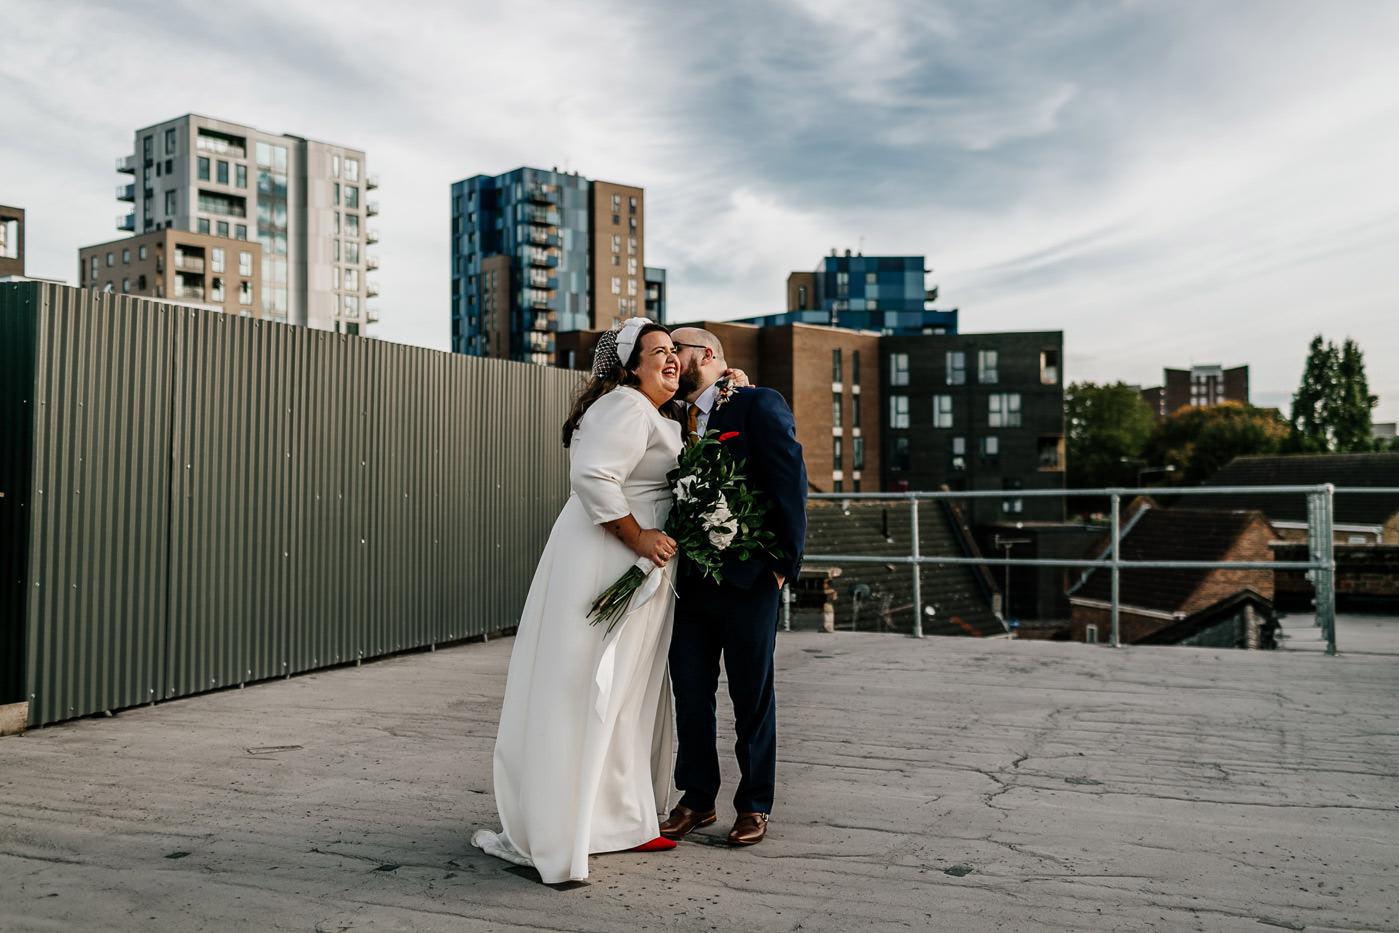 alternative london wedding photographer - one friendly place venue